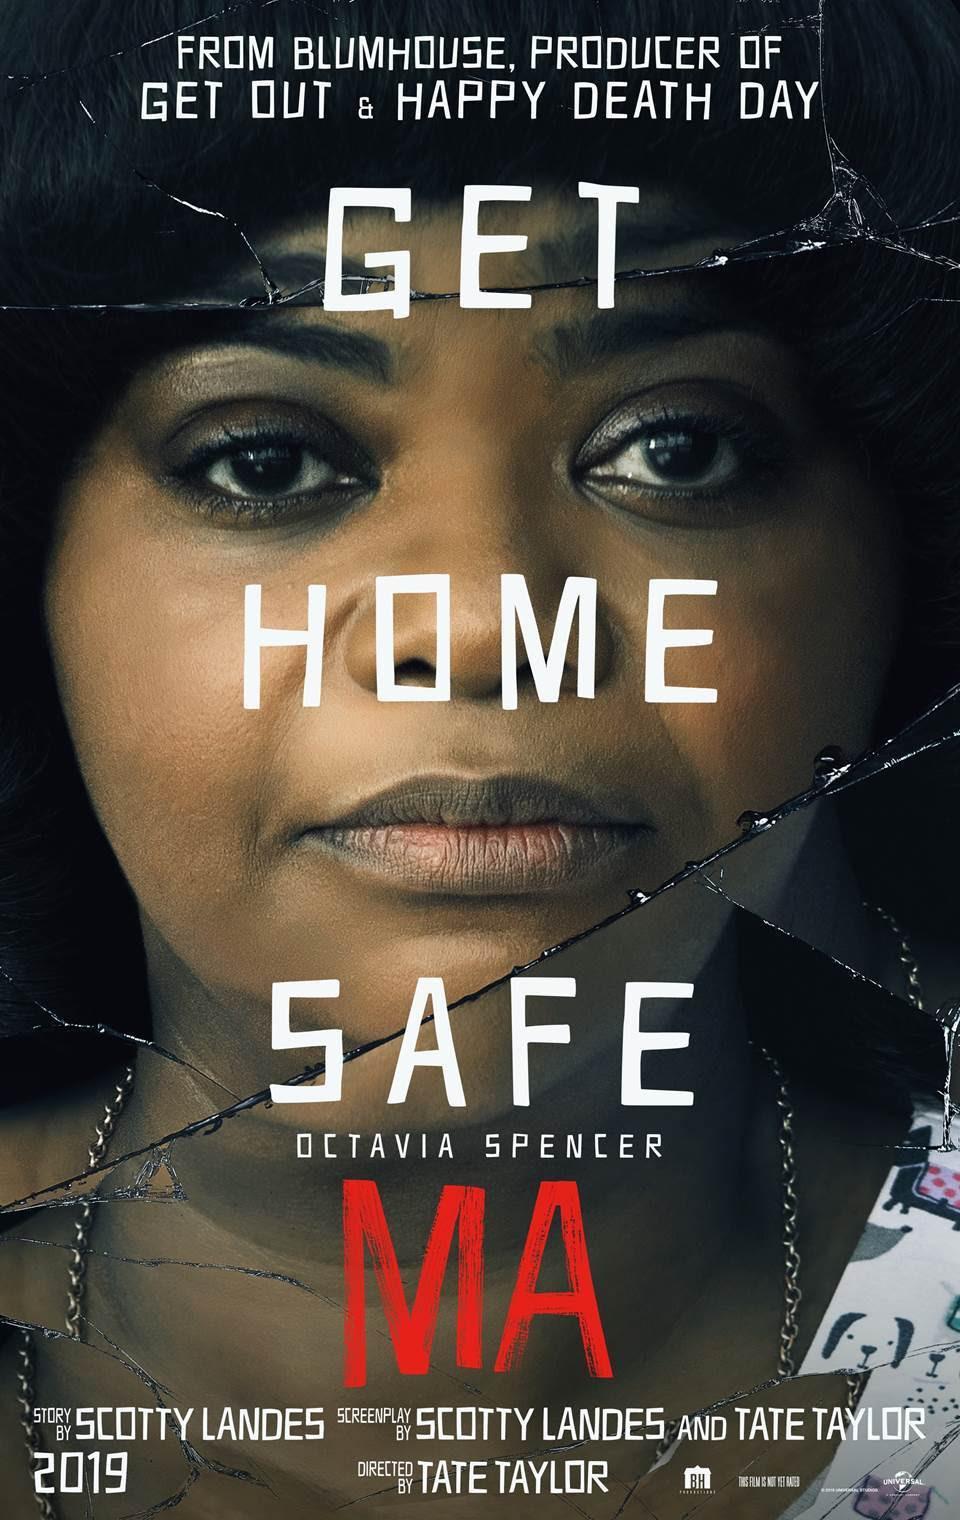 Ma (2019) Release Date, Plot, Cast, Movie Trailer - Octavia Spencer